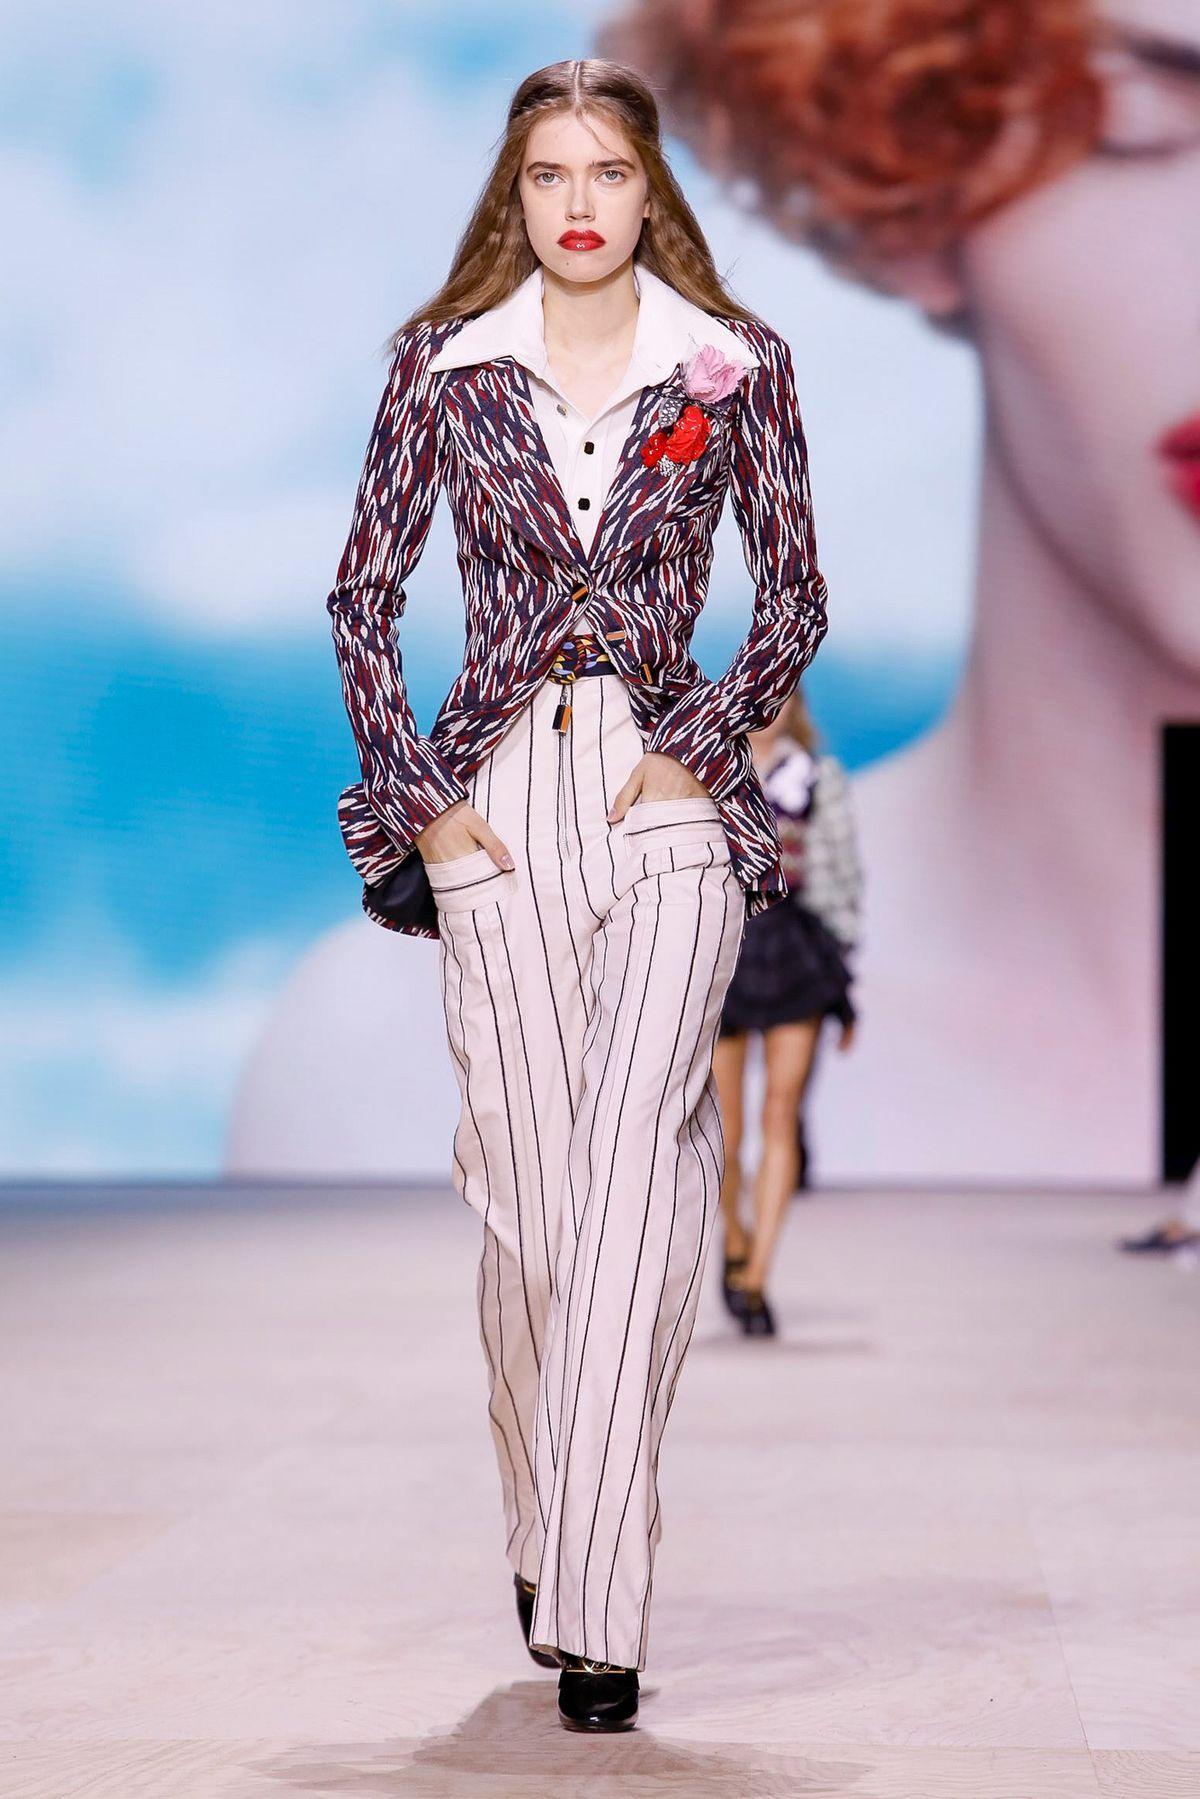 Paris Fashion Week Runway Highlights – Best Looks from Paris